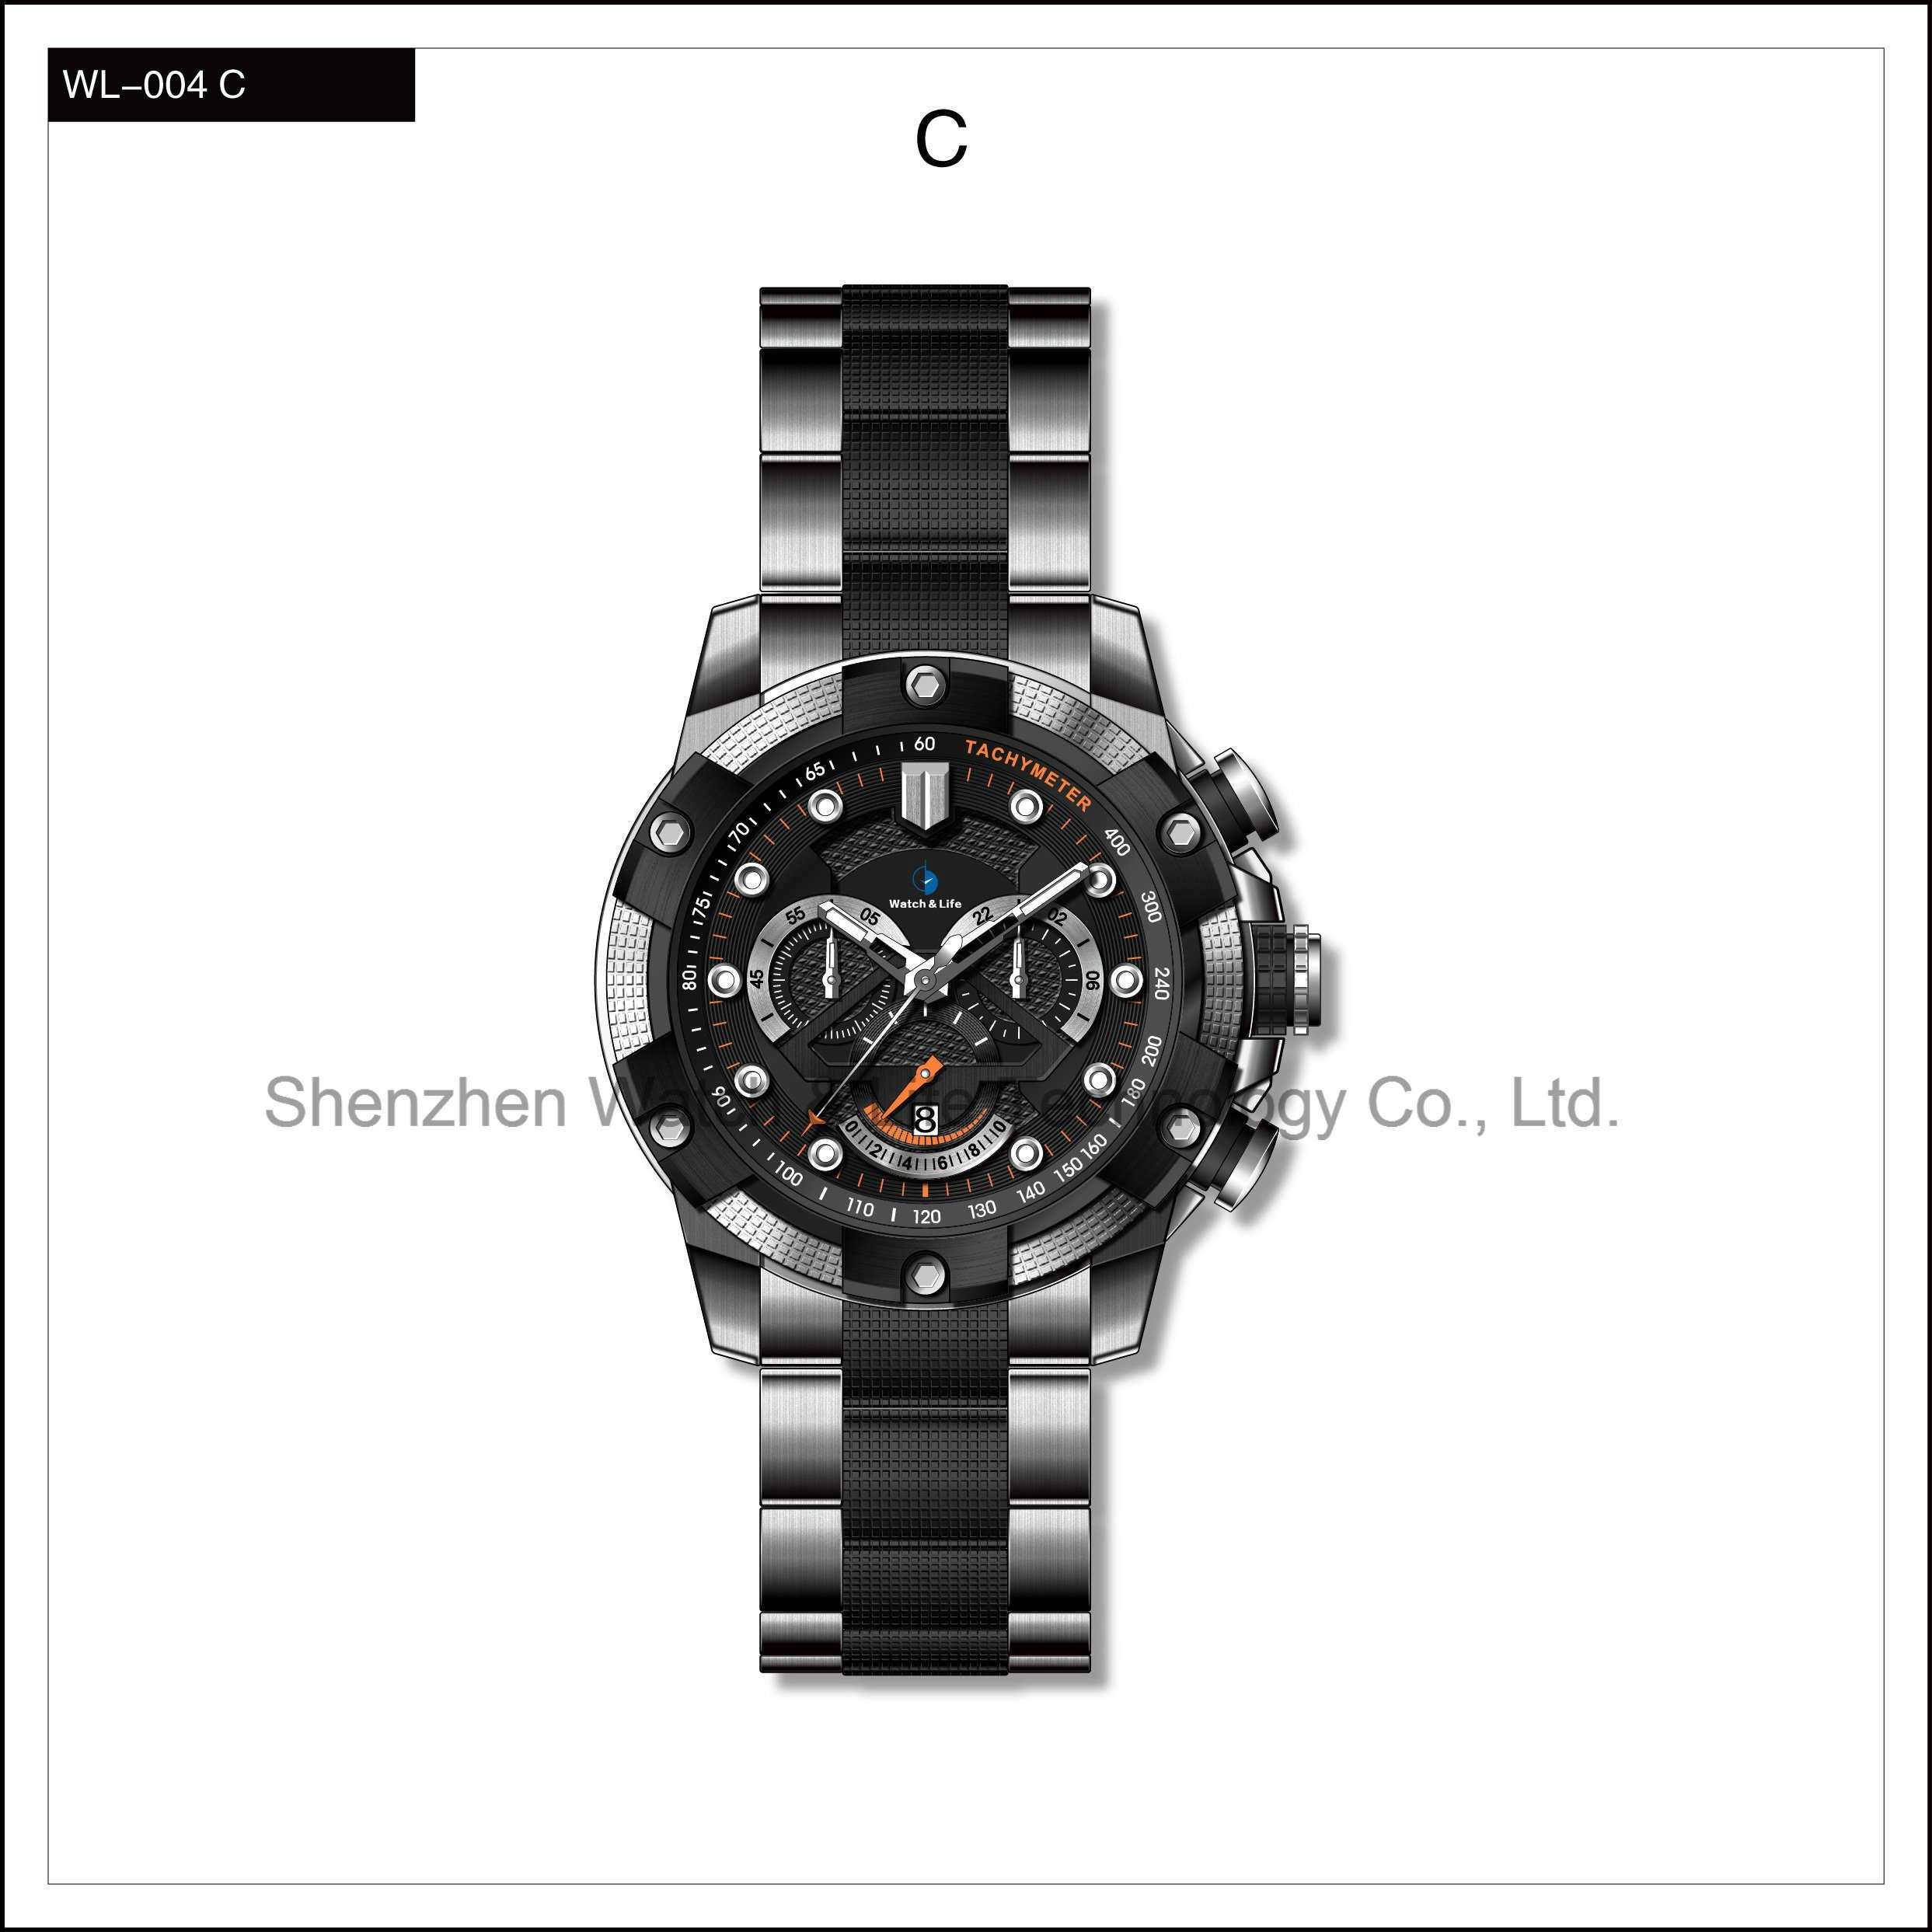 Heavy High Quality Sport Watch Stainless Steel Men′s Automatic Watch Wrist Watch